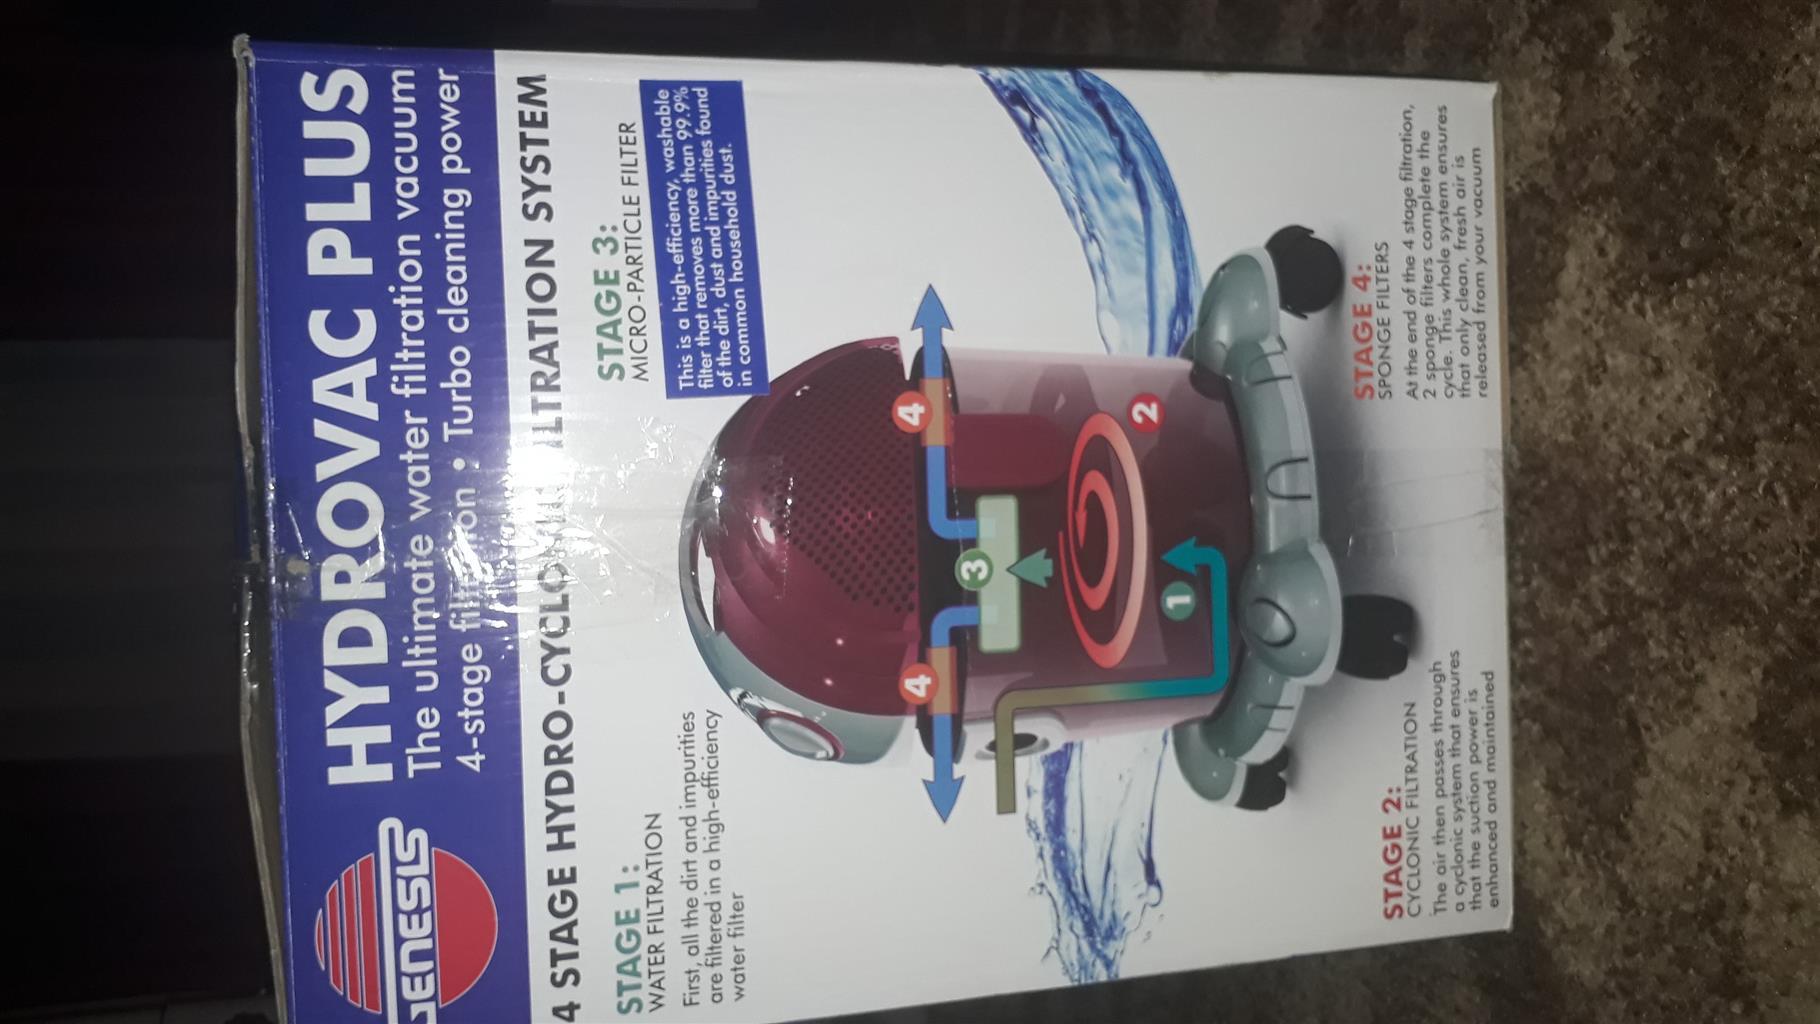 Genesis Hydrova Plus